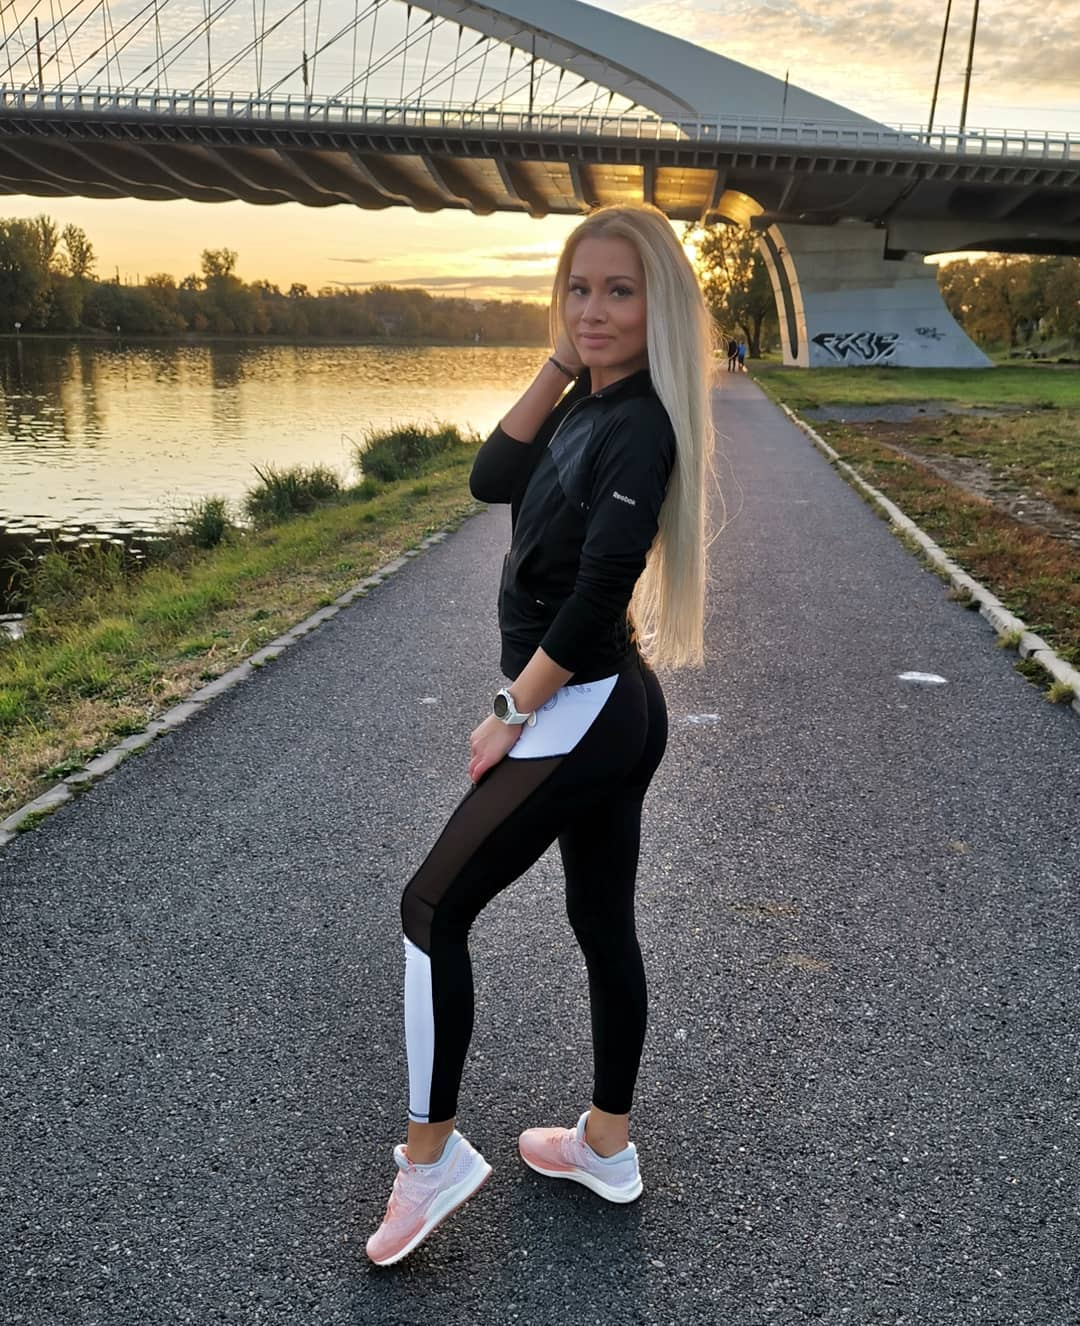 Petra-Svoboda-Wallpapers-Insta-Fit-Bio-7